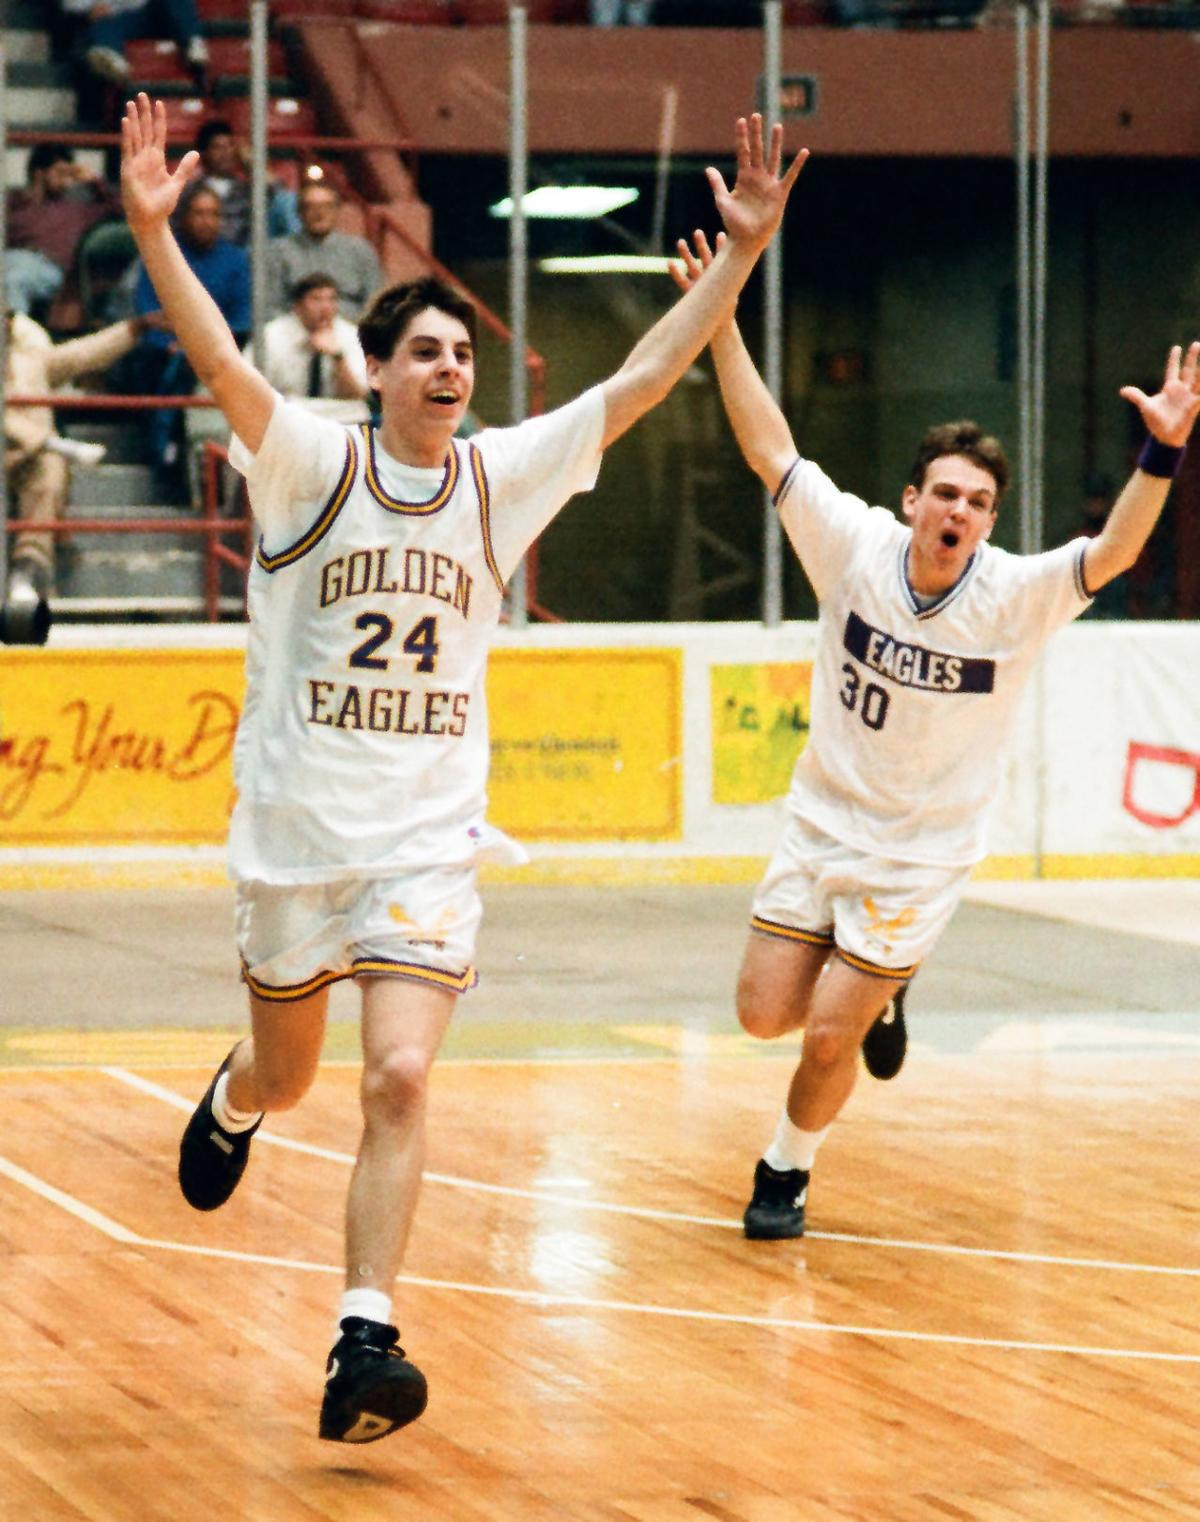 Clyde-Savannah basketball 1993